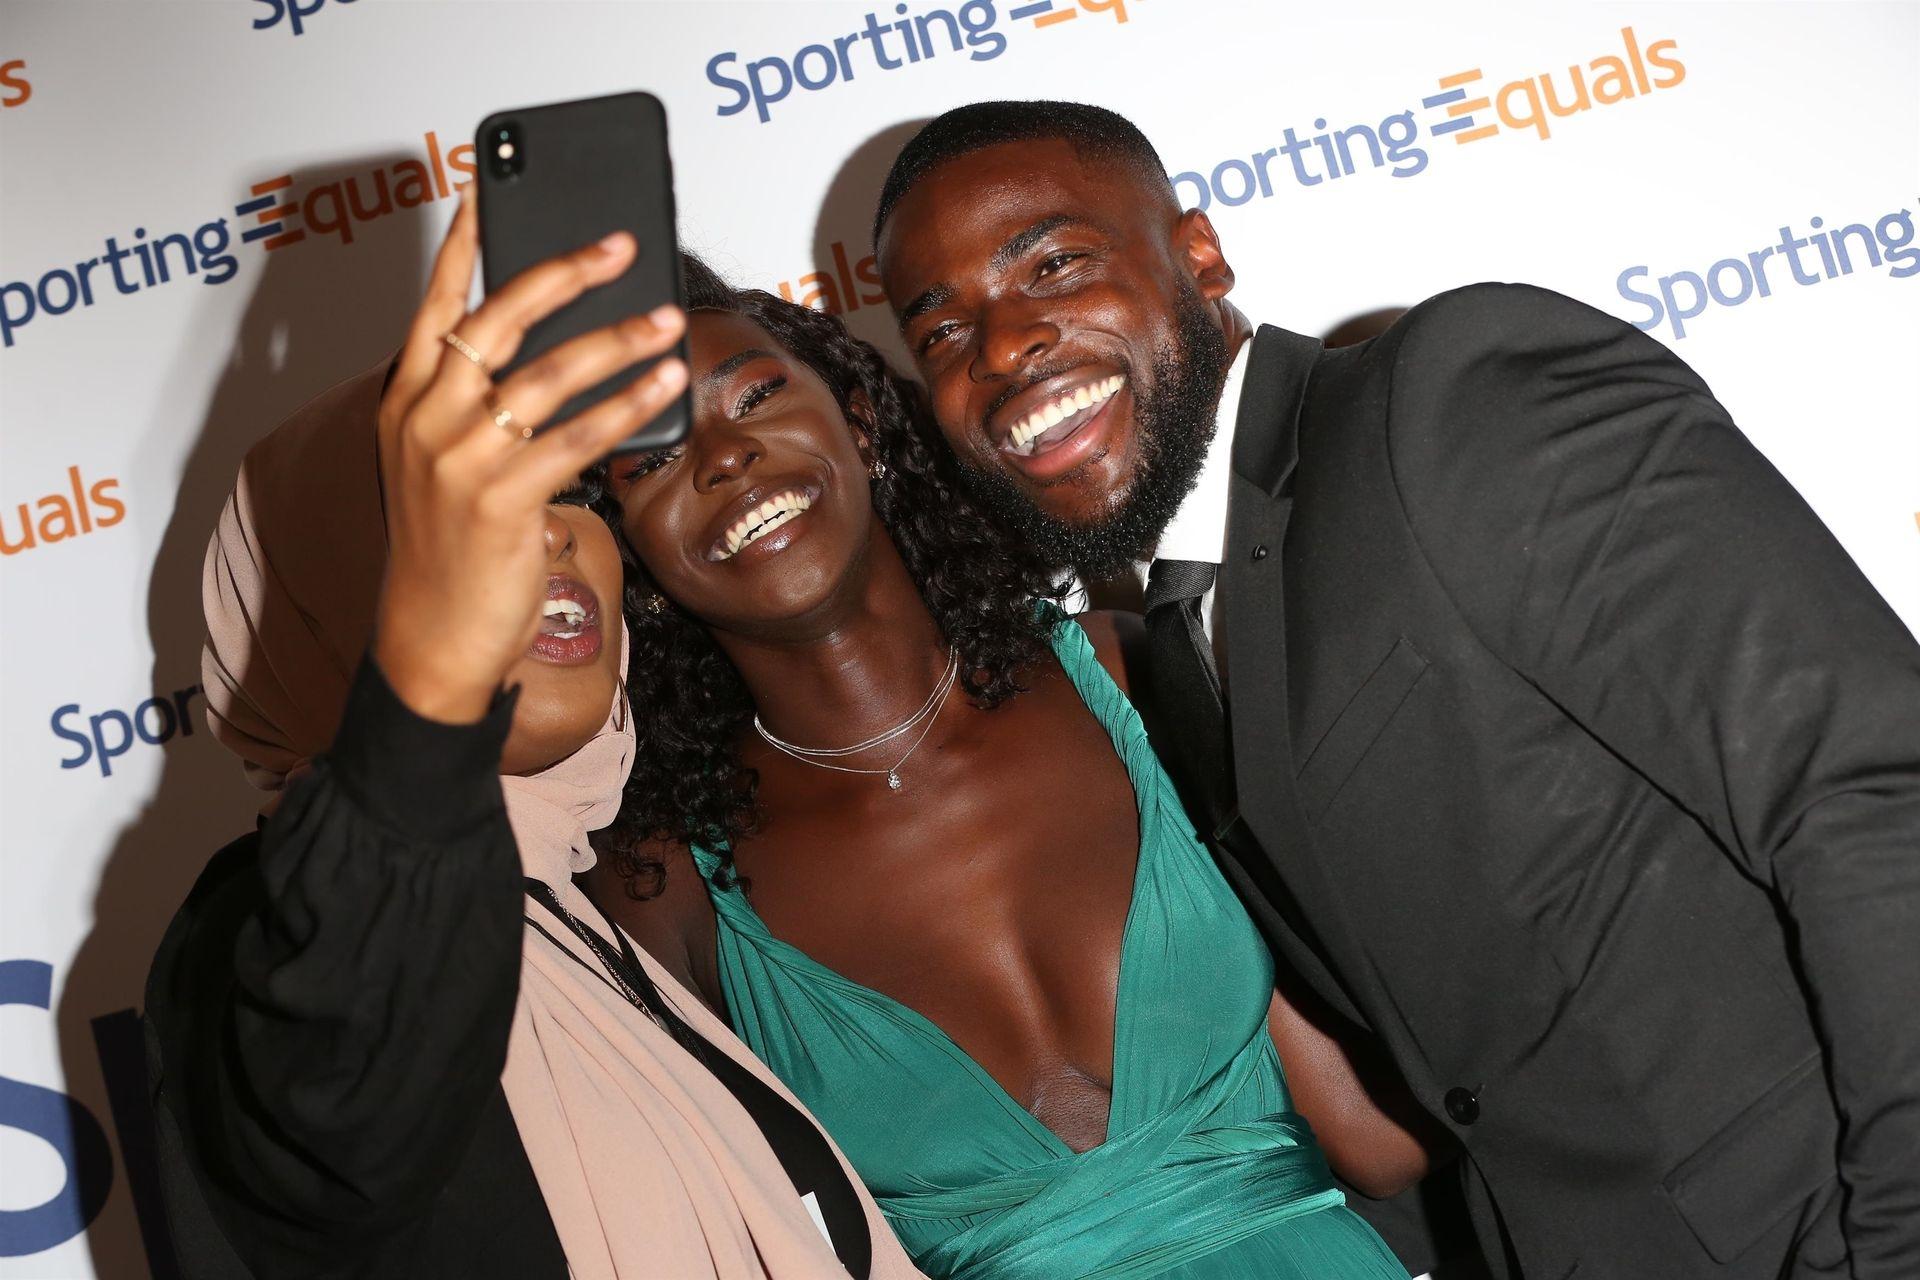 Mike Boateng & Priscilla Anyabu Are Seen At British Ethnic Diversity Sports Awards 0082